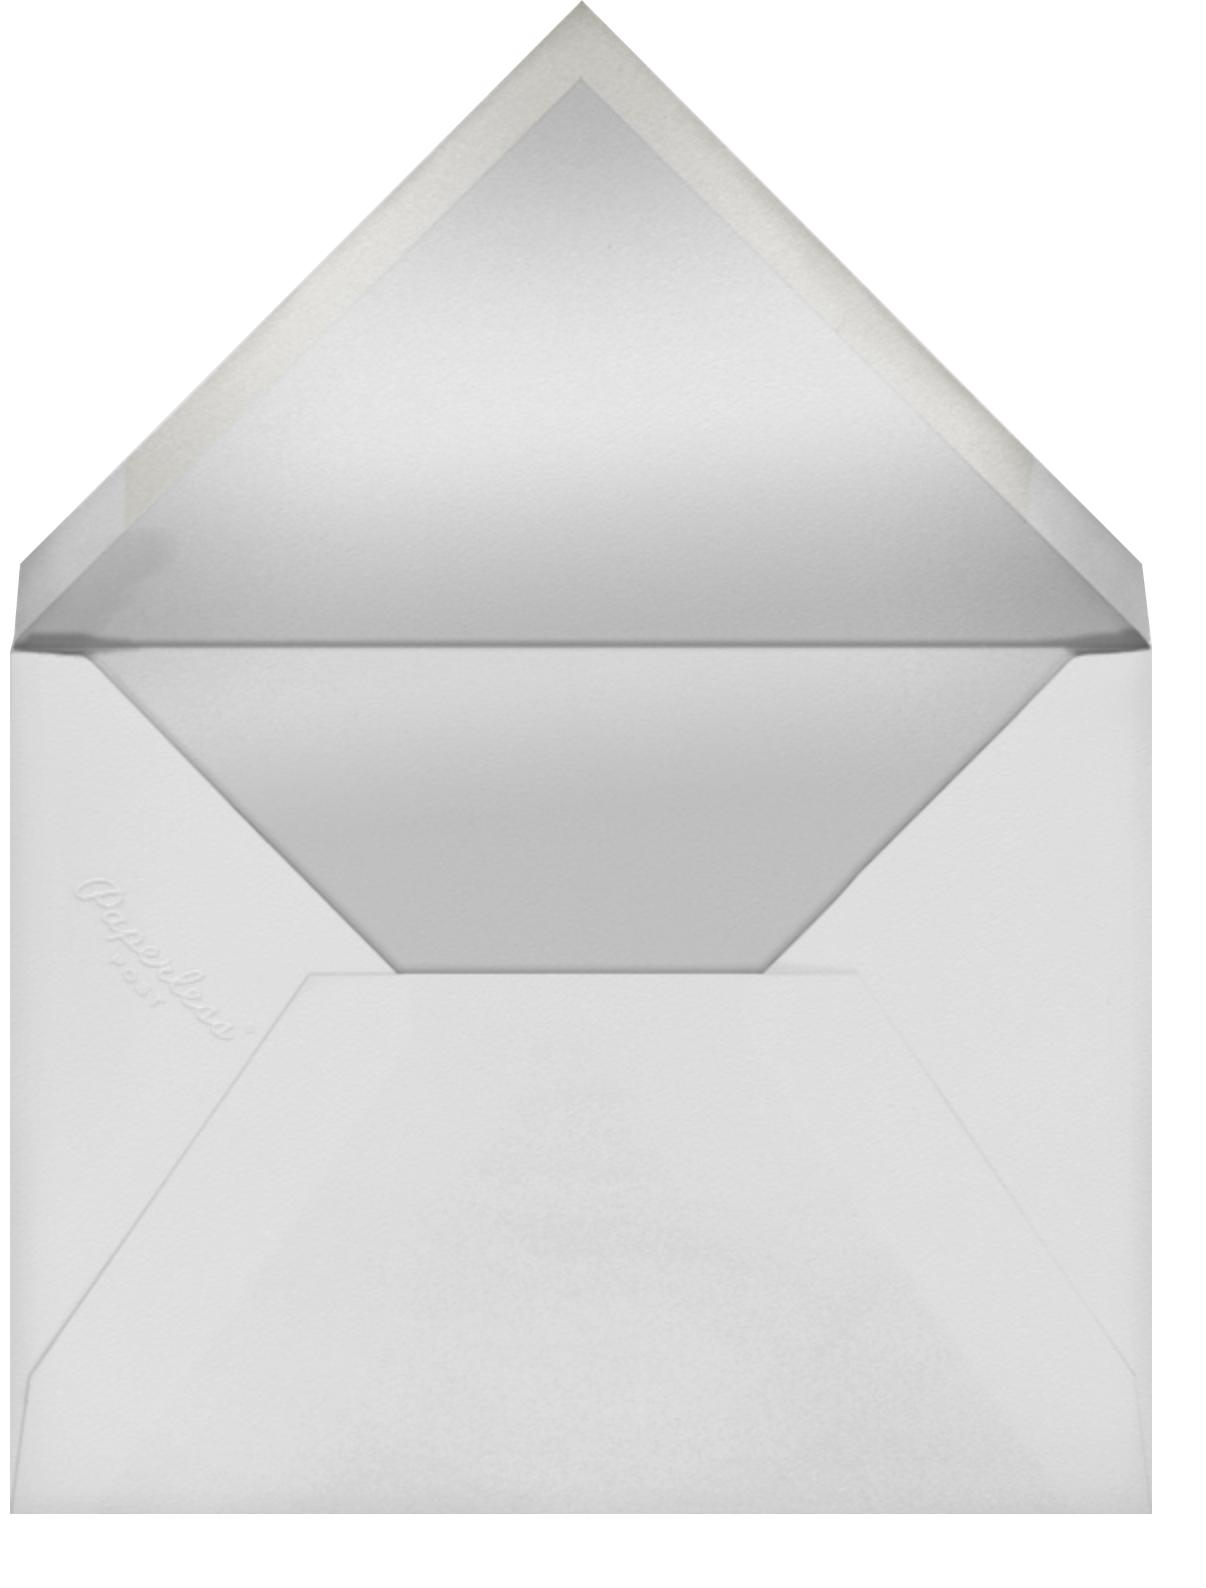 Crete Crimson Square - Paperless Post - General entertaining - envelope back